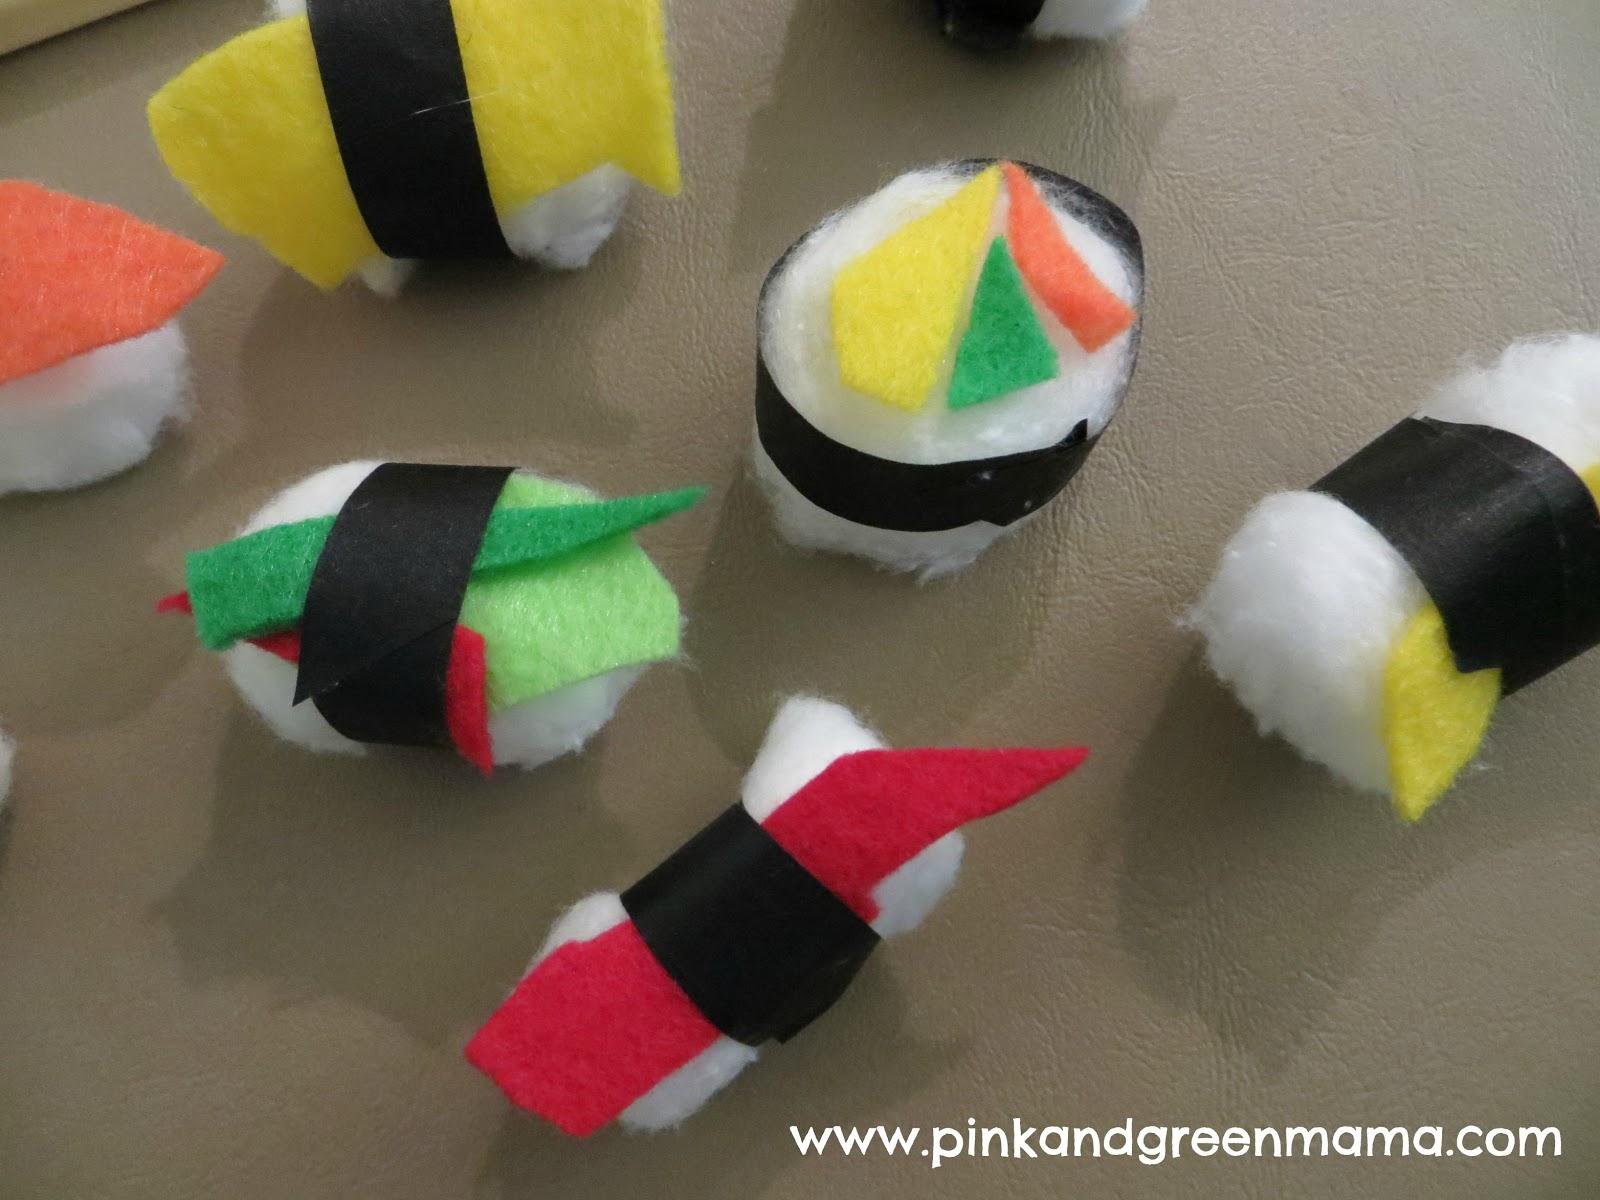 pink and green mama cotton ball sushi craft